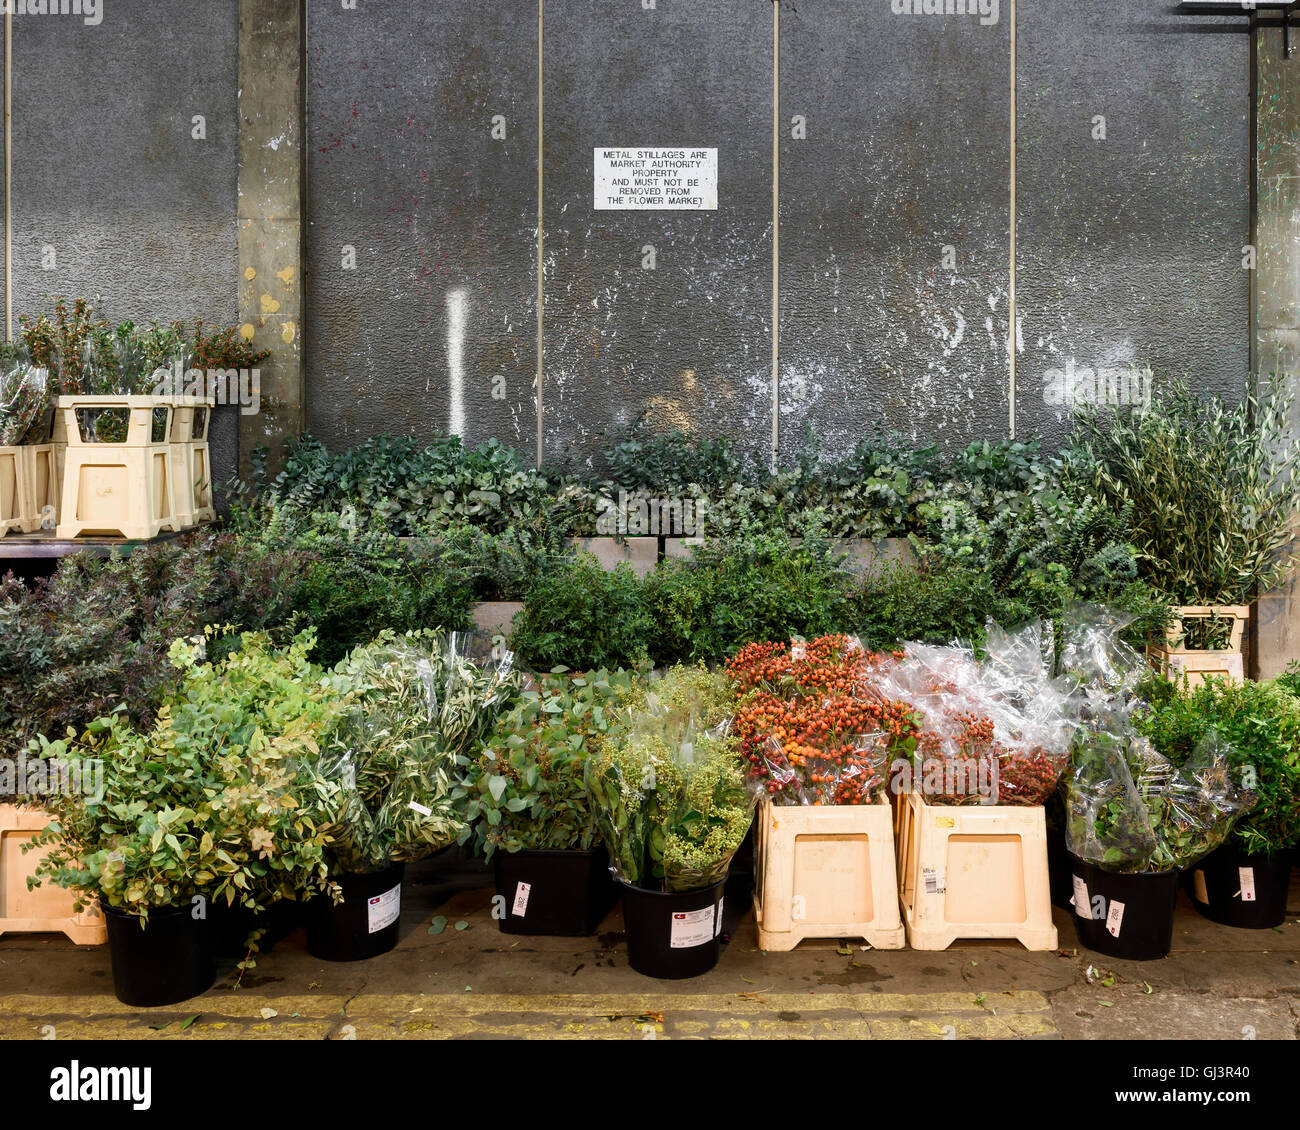 Plants in the flower market. New Covent Garden Market, London, United Kingdom. Architect: -, 1974. Stock Photo